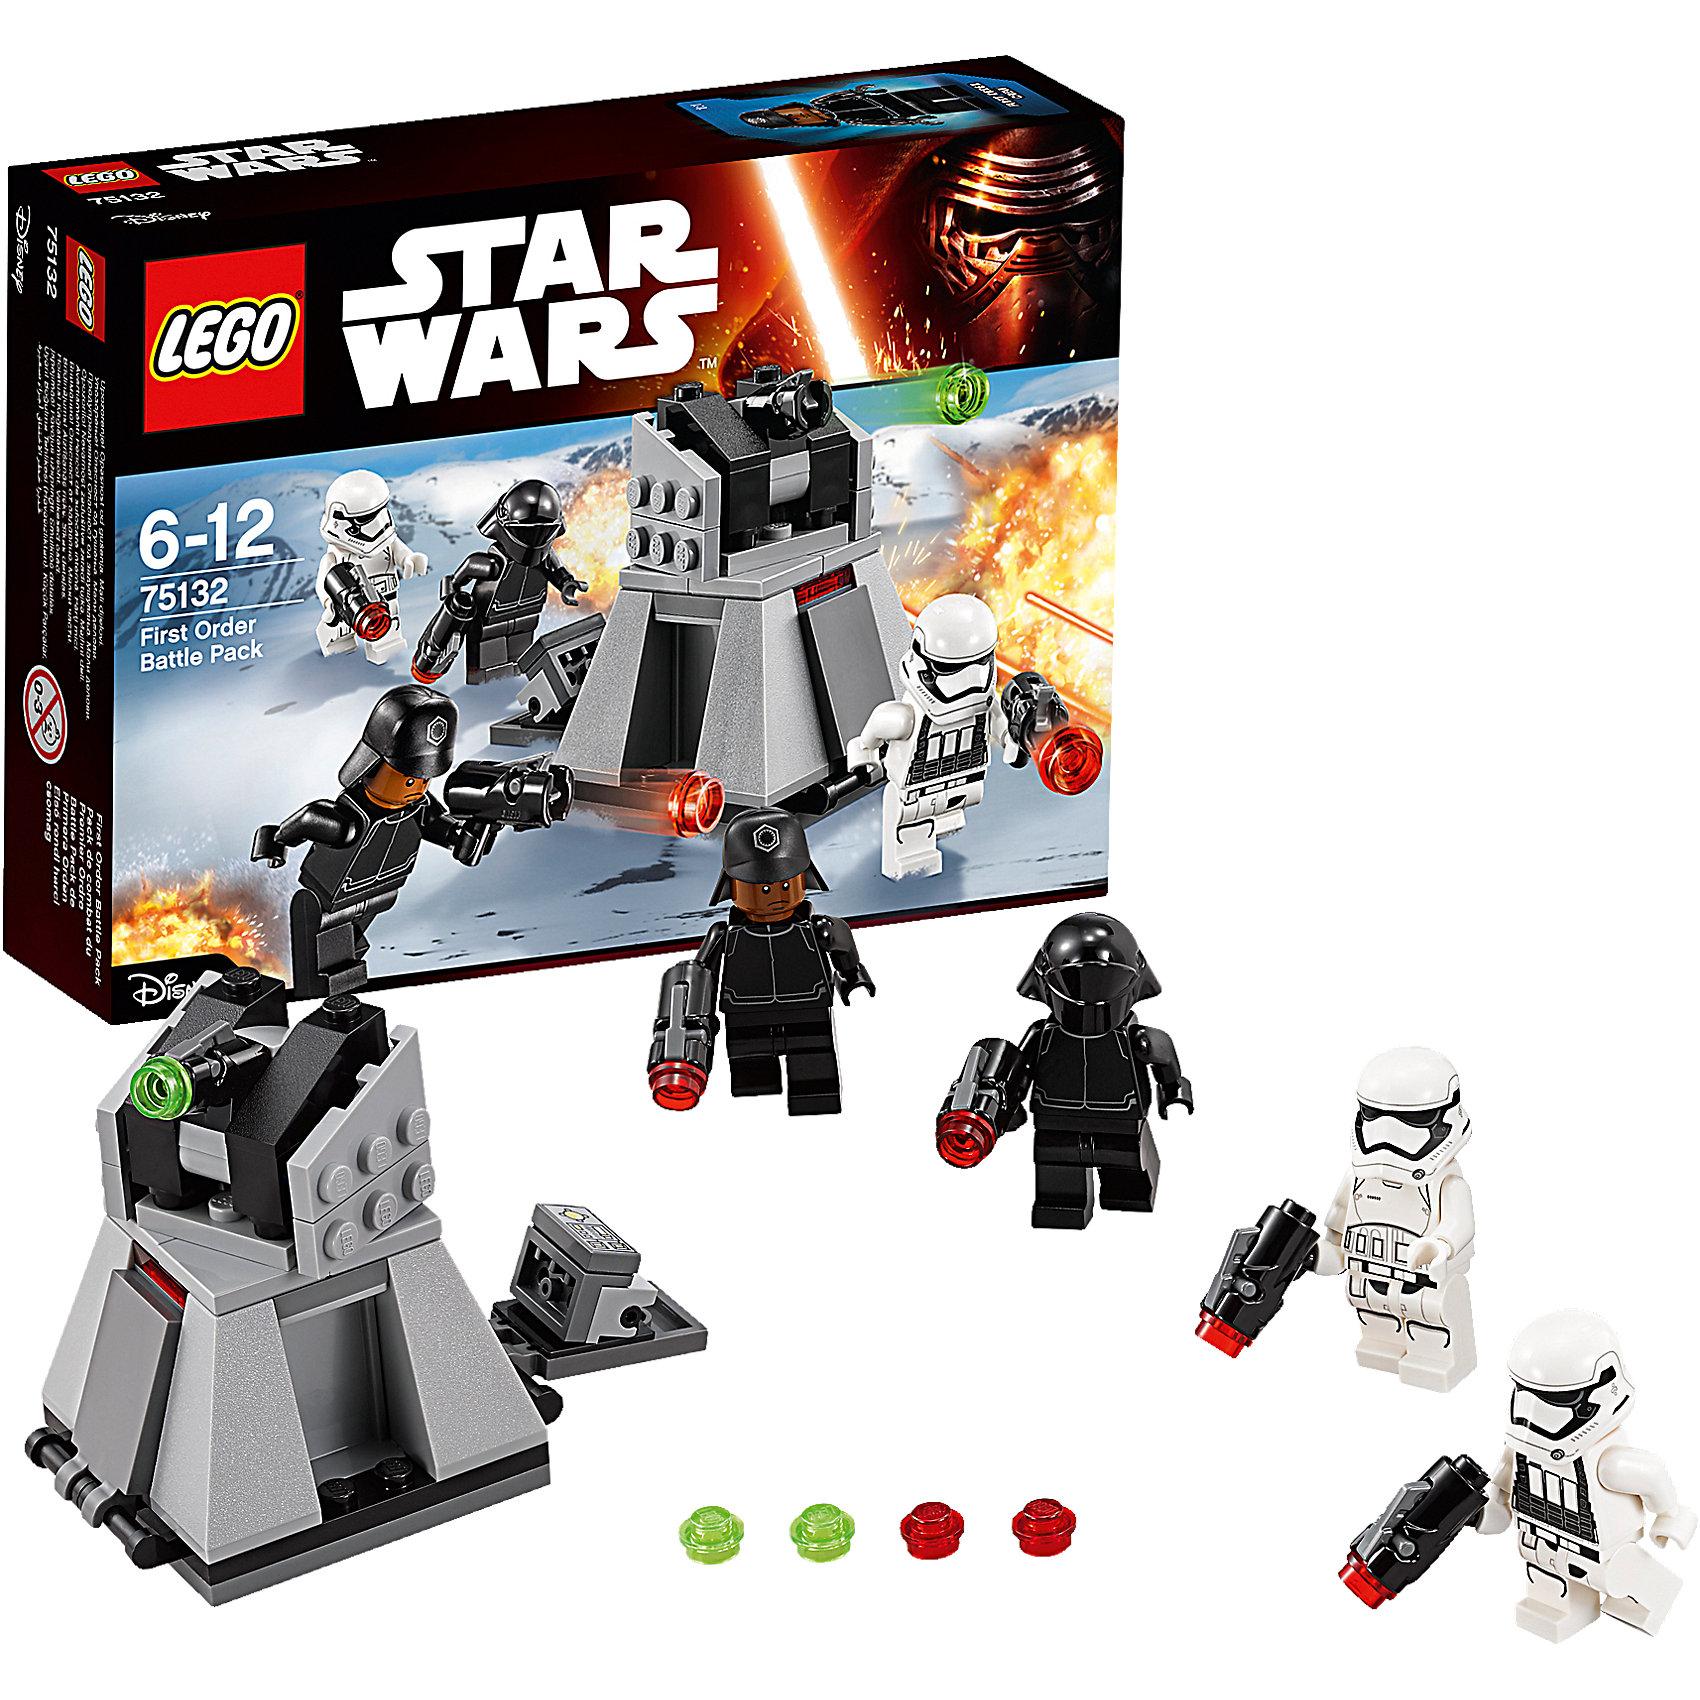 LEGO Star Wars 75132: ������ ����� ������� ������LEGO Star Wars (���� �������� �����) 75132: ������ ����� ������� ������ ������ ���������� �������� ��� ���� ����������� ���������� ��������. ��������� ������������� ����� �� 7 ������� �������� �����. ����������� ���� � ������ ����������� �������� ����� ������ ������� ������ � ������� �������������. � ��������� �� ������� ��� ����������� ������ ��� ������ ������� ����������� - ������������ ��������, ������� ����� ����������� ������ ����� ��� ������ � ��������� �������. ������ ���������� �������������� ��������� � ������� �� ����� � ������ �������. �� ������� ����� ��������� ����������� ����������� ����� � ������, ������� �������  �� ������ �������� �������, �� � ������������ ������������ �������������. � ��������� ������� ������, ������� �����������, ������������ ������ � ����������� � ������ ���������� ������������. � �������� ������ ������ ����������� ������ ������� ������ � �������. <br><br>��� ������������ ����� ���� �������� ����� ������� �� ������� ���������� �������� �������� ����� � ������������� ����� ���������� ������ � ������� ������. � ������� ������������ ��� �������� �������� ���������� � ������ �������, ��������������� � ������.<br>�������������� �����������, ������, ������, ������, ������� ���������� ��������� ����� �����������, � ������� �������� �����������.<br><br>�������������� ����������:<br><br>- ���� � ������������� LEGO (����) ��������� ������ �������� �������, �������� � �����������, ���� ��� ����������� � ��������������.<br>- ���������� �������: 88.<br>- ���������� ���������: 4.<br>- �����: LEGO Star Wars (���� �������� �����).<br>- ��������: �������.<br>- ������ ��������: 19,5 � 4,5 � 14 ��.<br>- ���: 0,125 ��.<br><br>����������� LEGO Star Wars (���� �������� �����) 75132: Confidential Battle pack Episode 7 Villa ����� ������ � ����� ��������-��������.<br><br>������ ��: 191<br>������� ��: 139<br>������ ��: 49<br>��� �: 115<br>������� �� �������: 72<br>������� �� �������: 144<br>���: �������<b